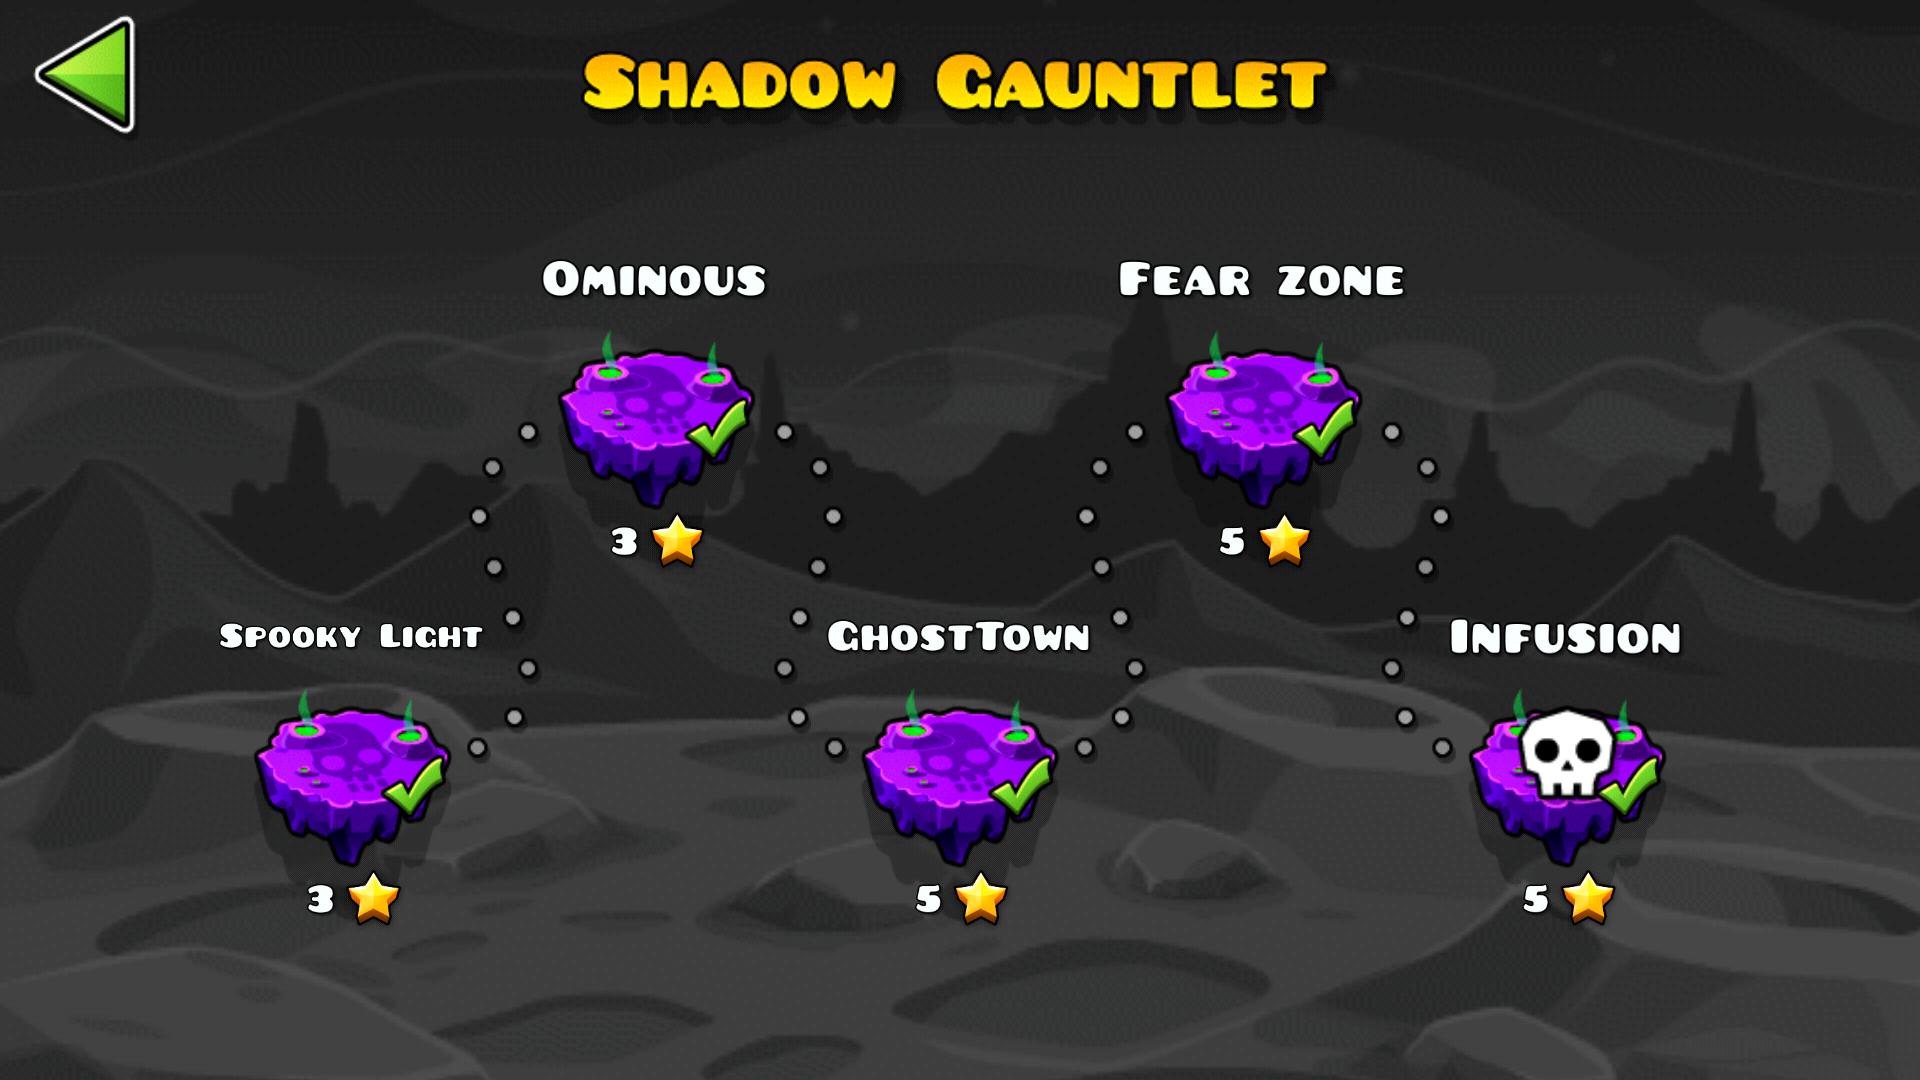 ShadowGauntlet